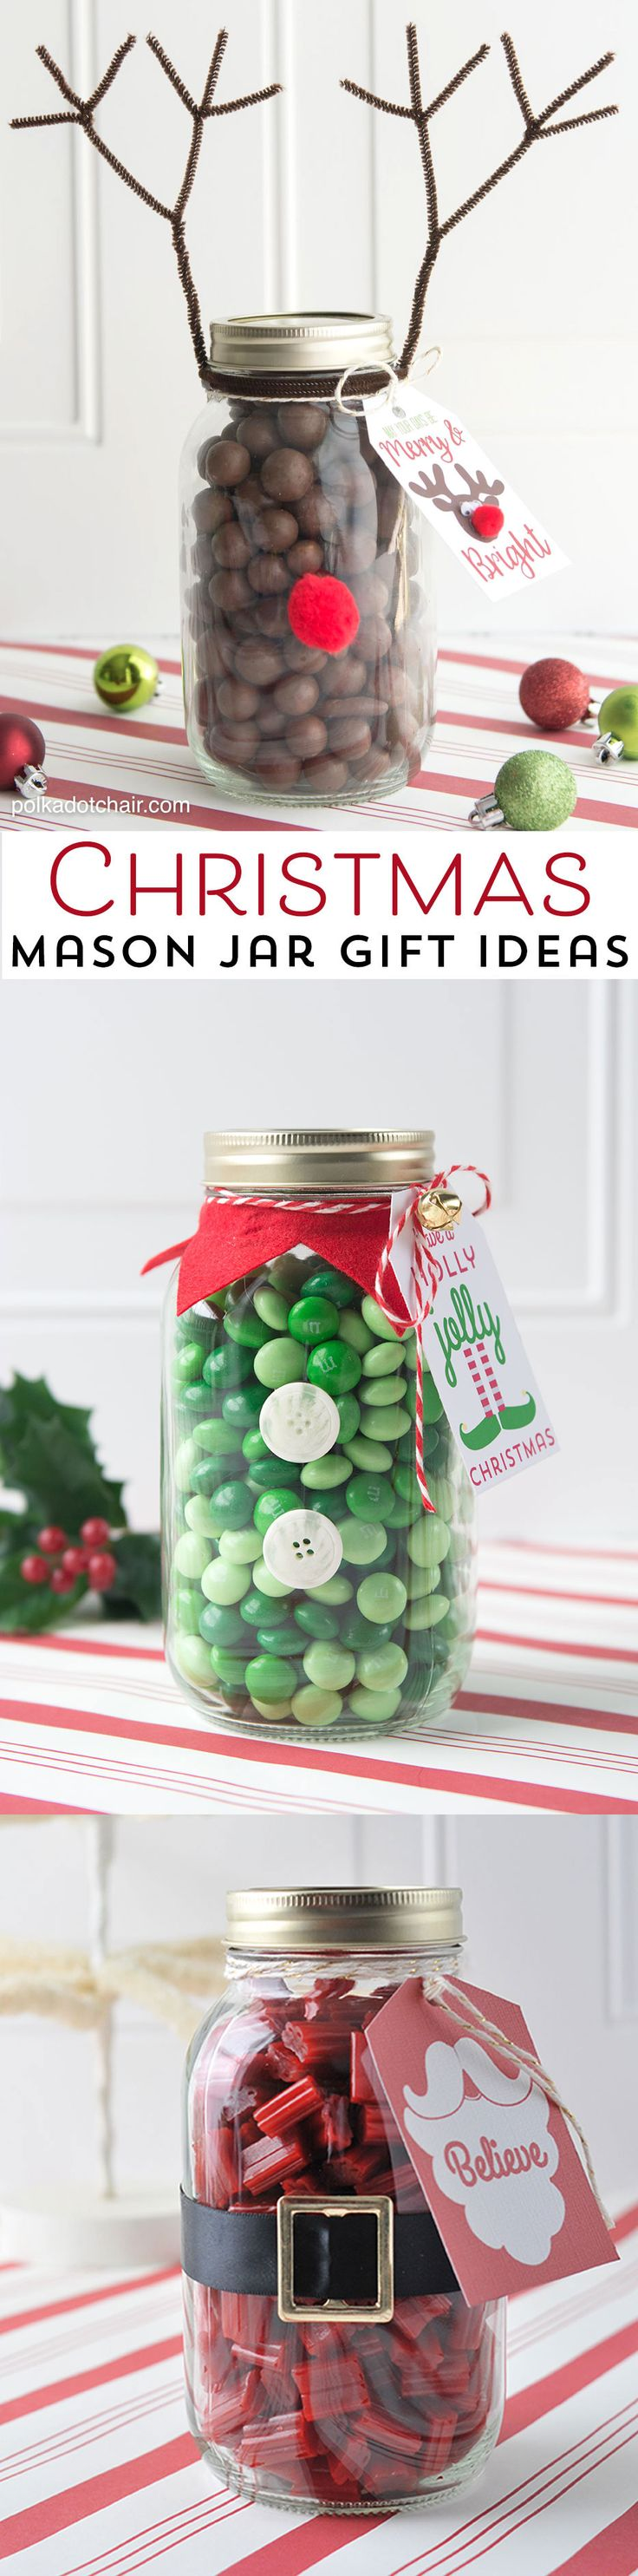 Reindeer Mason Jar Christmas Gift idea, so cute and easy. Would make a fun neigh...